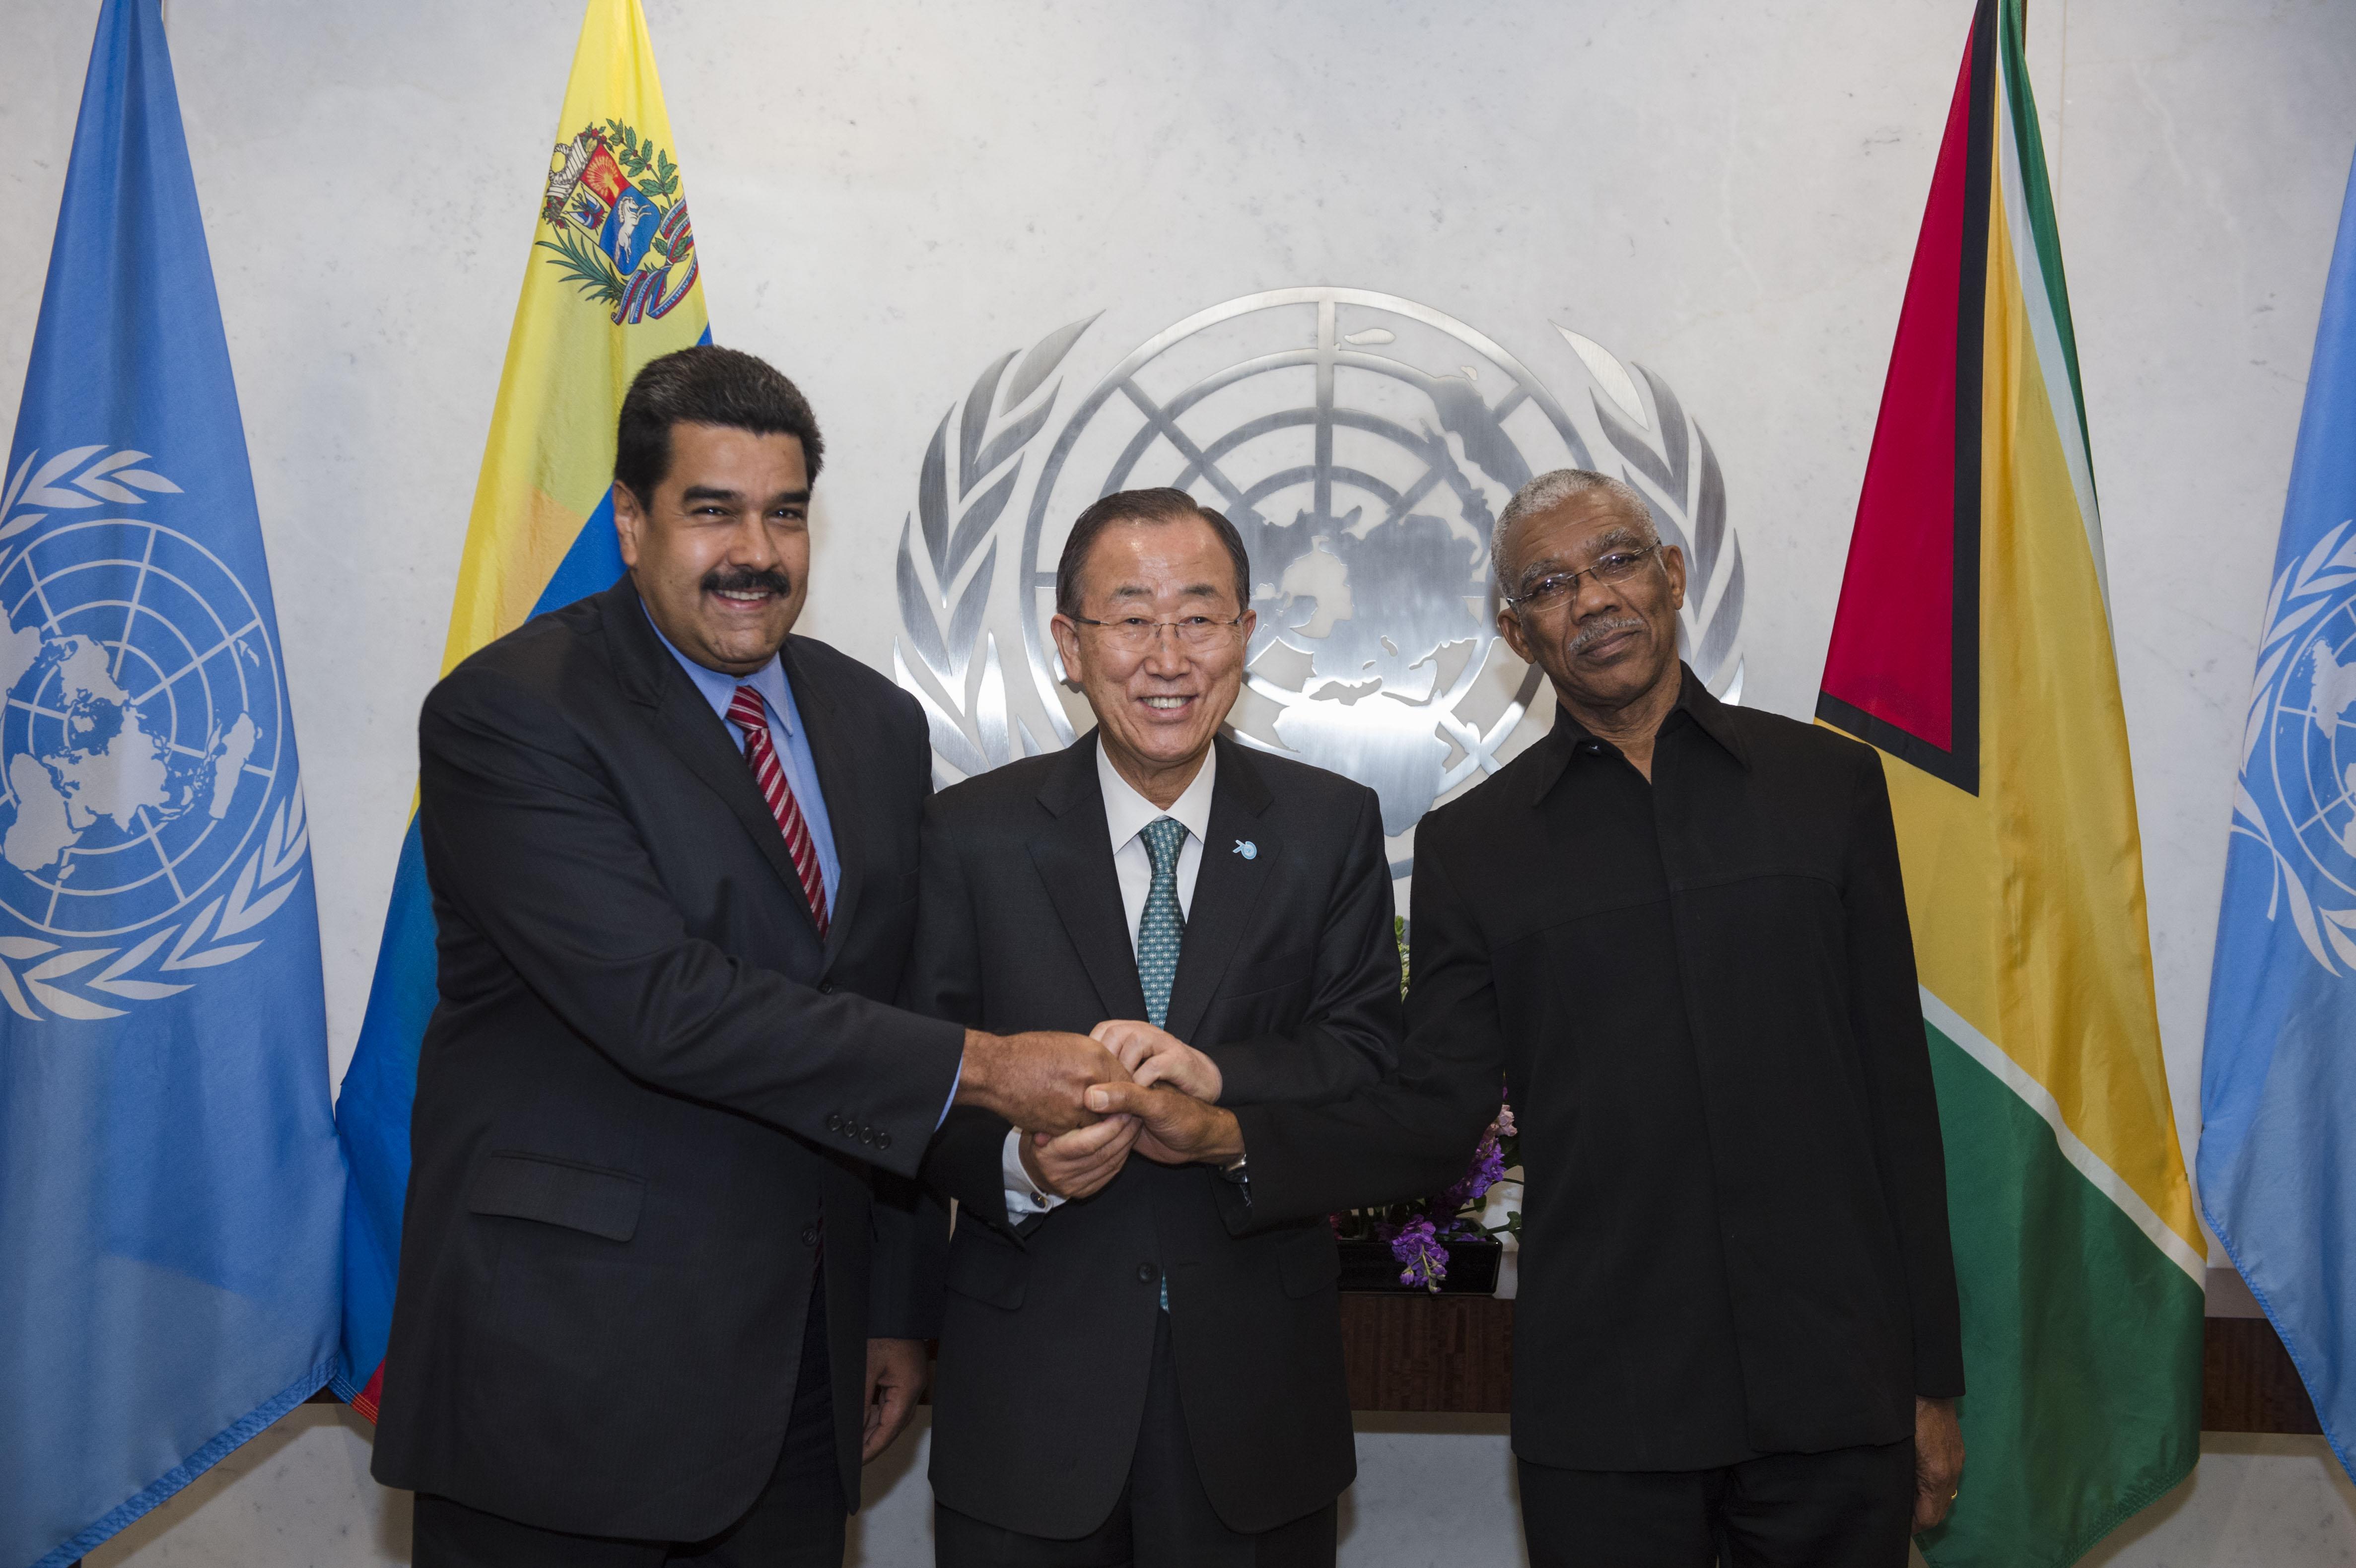 Photo opportunity: The Secretary-General with H.E. Mr. Nicolas Maduro Moros, President, Venezuela and H.E. Mr. David Arthur Granger, President, Guyana